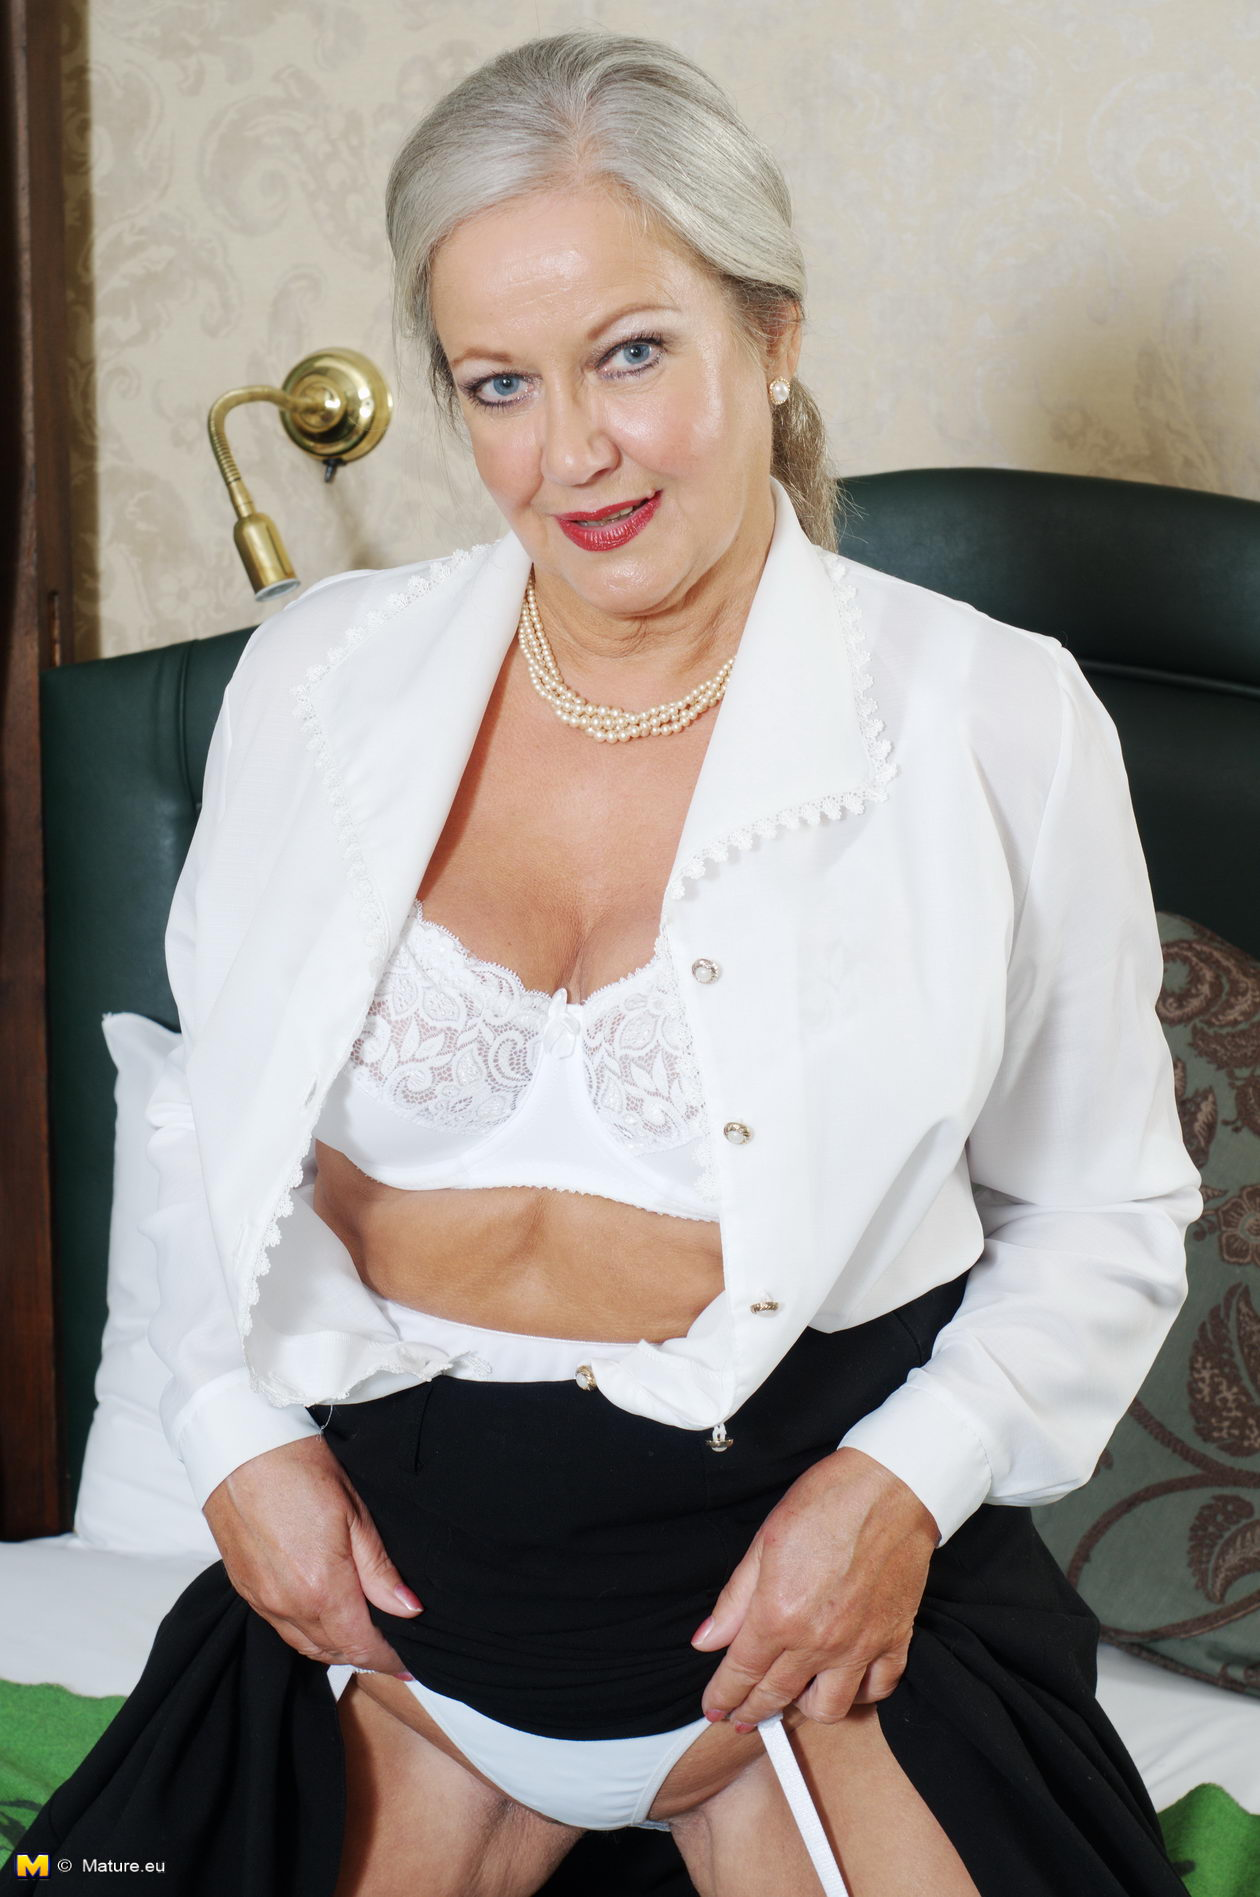 At Body Hot Camwet.com Insanely